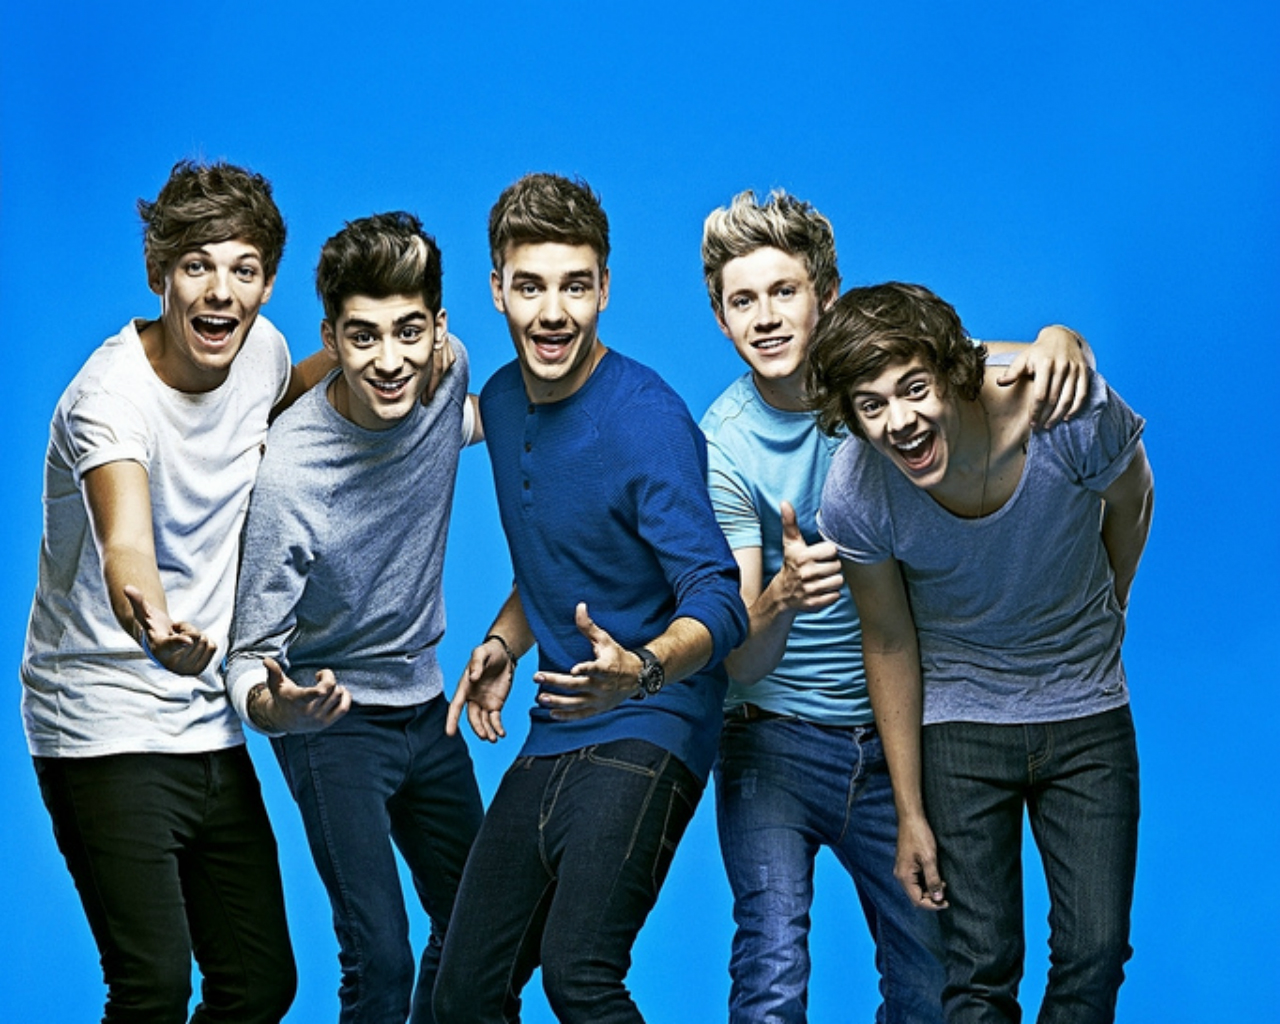 Boy Band Wallpaper: One Direction Wallpaper